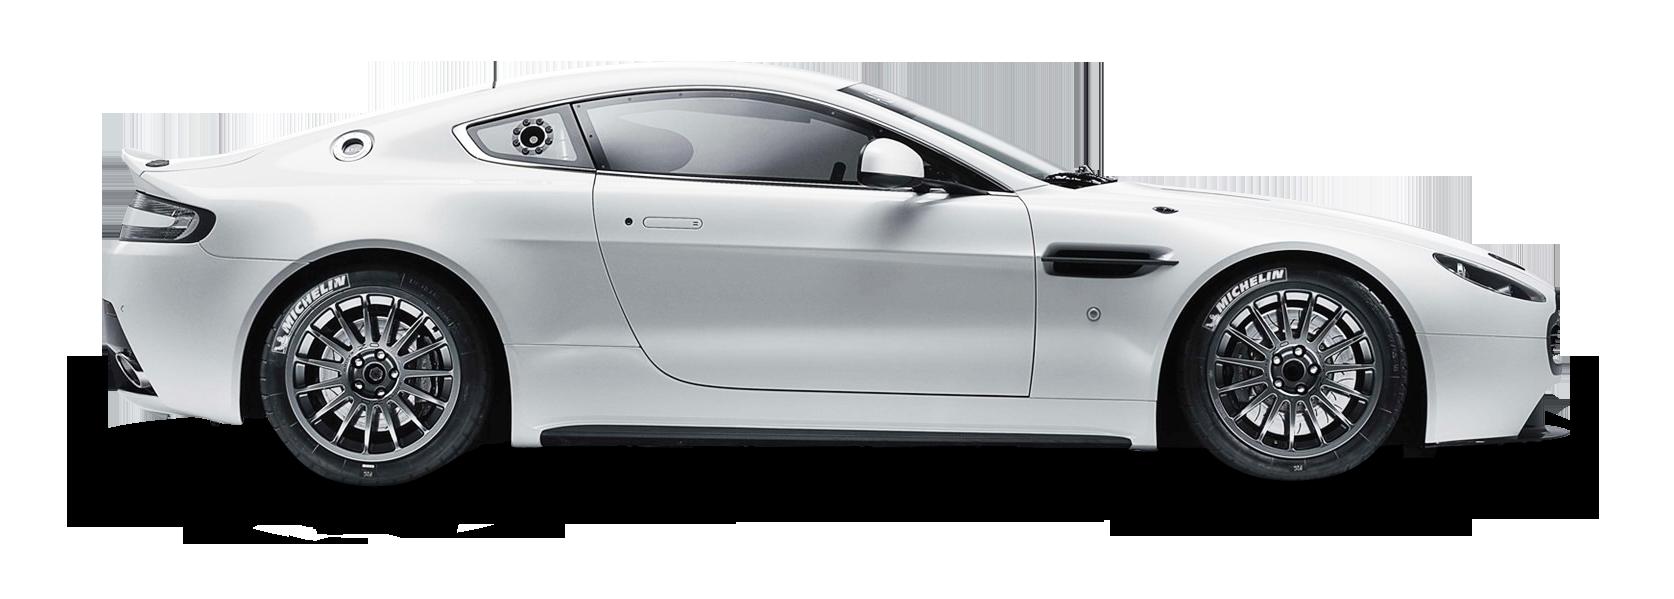 Aston Martin Vantage GT4 White Car PNG Image